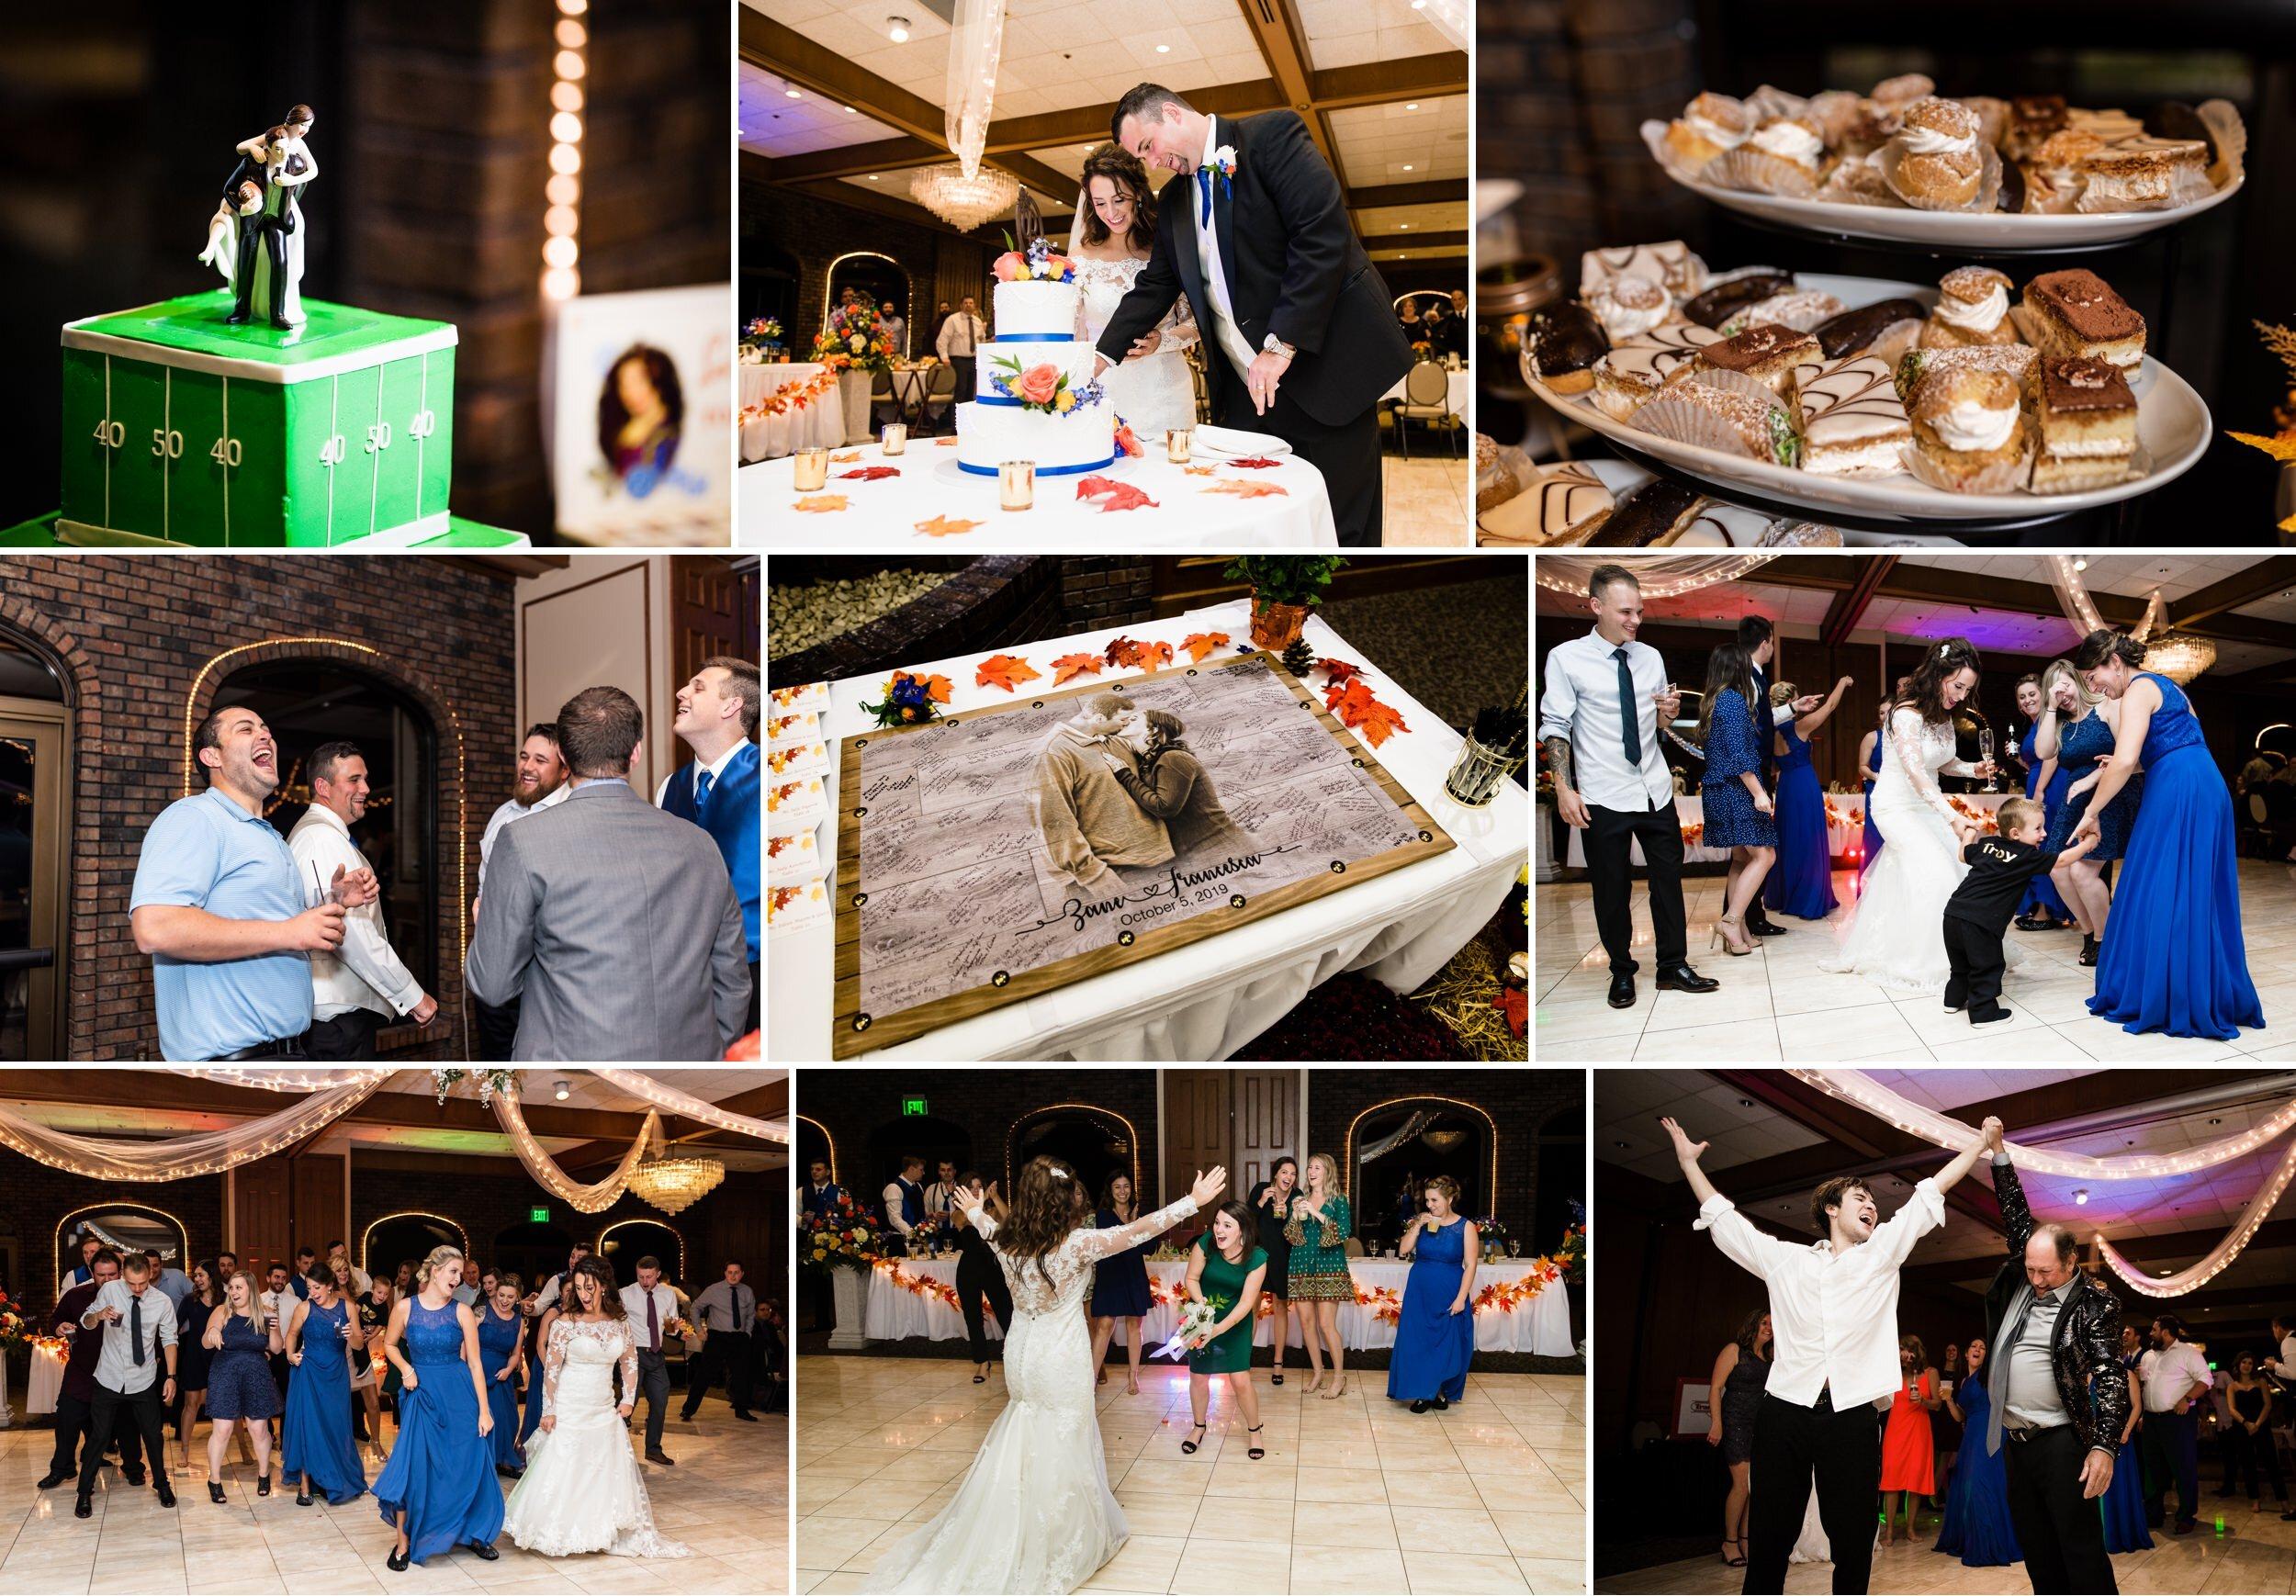 Wedding reception fun at Wicker Park Social Center.